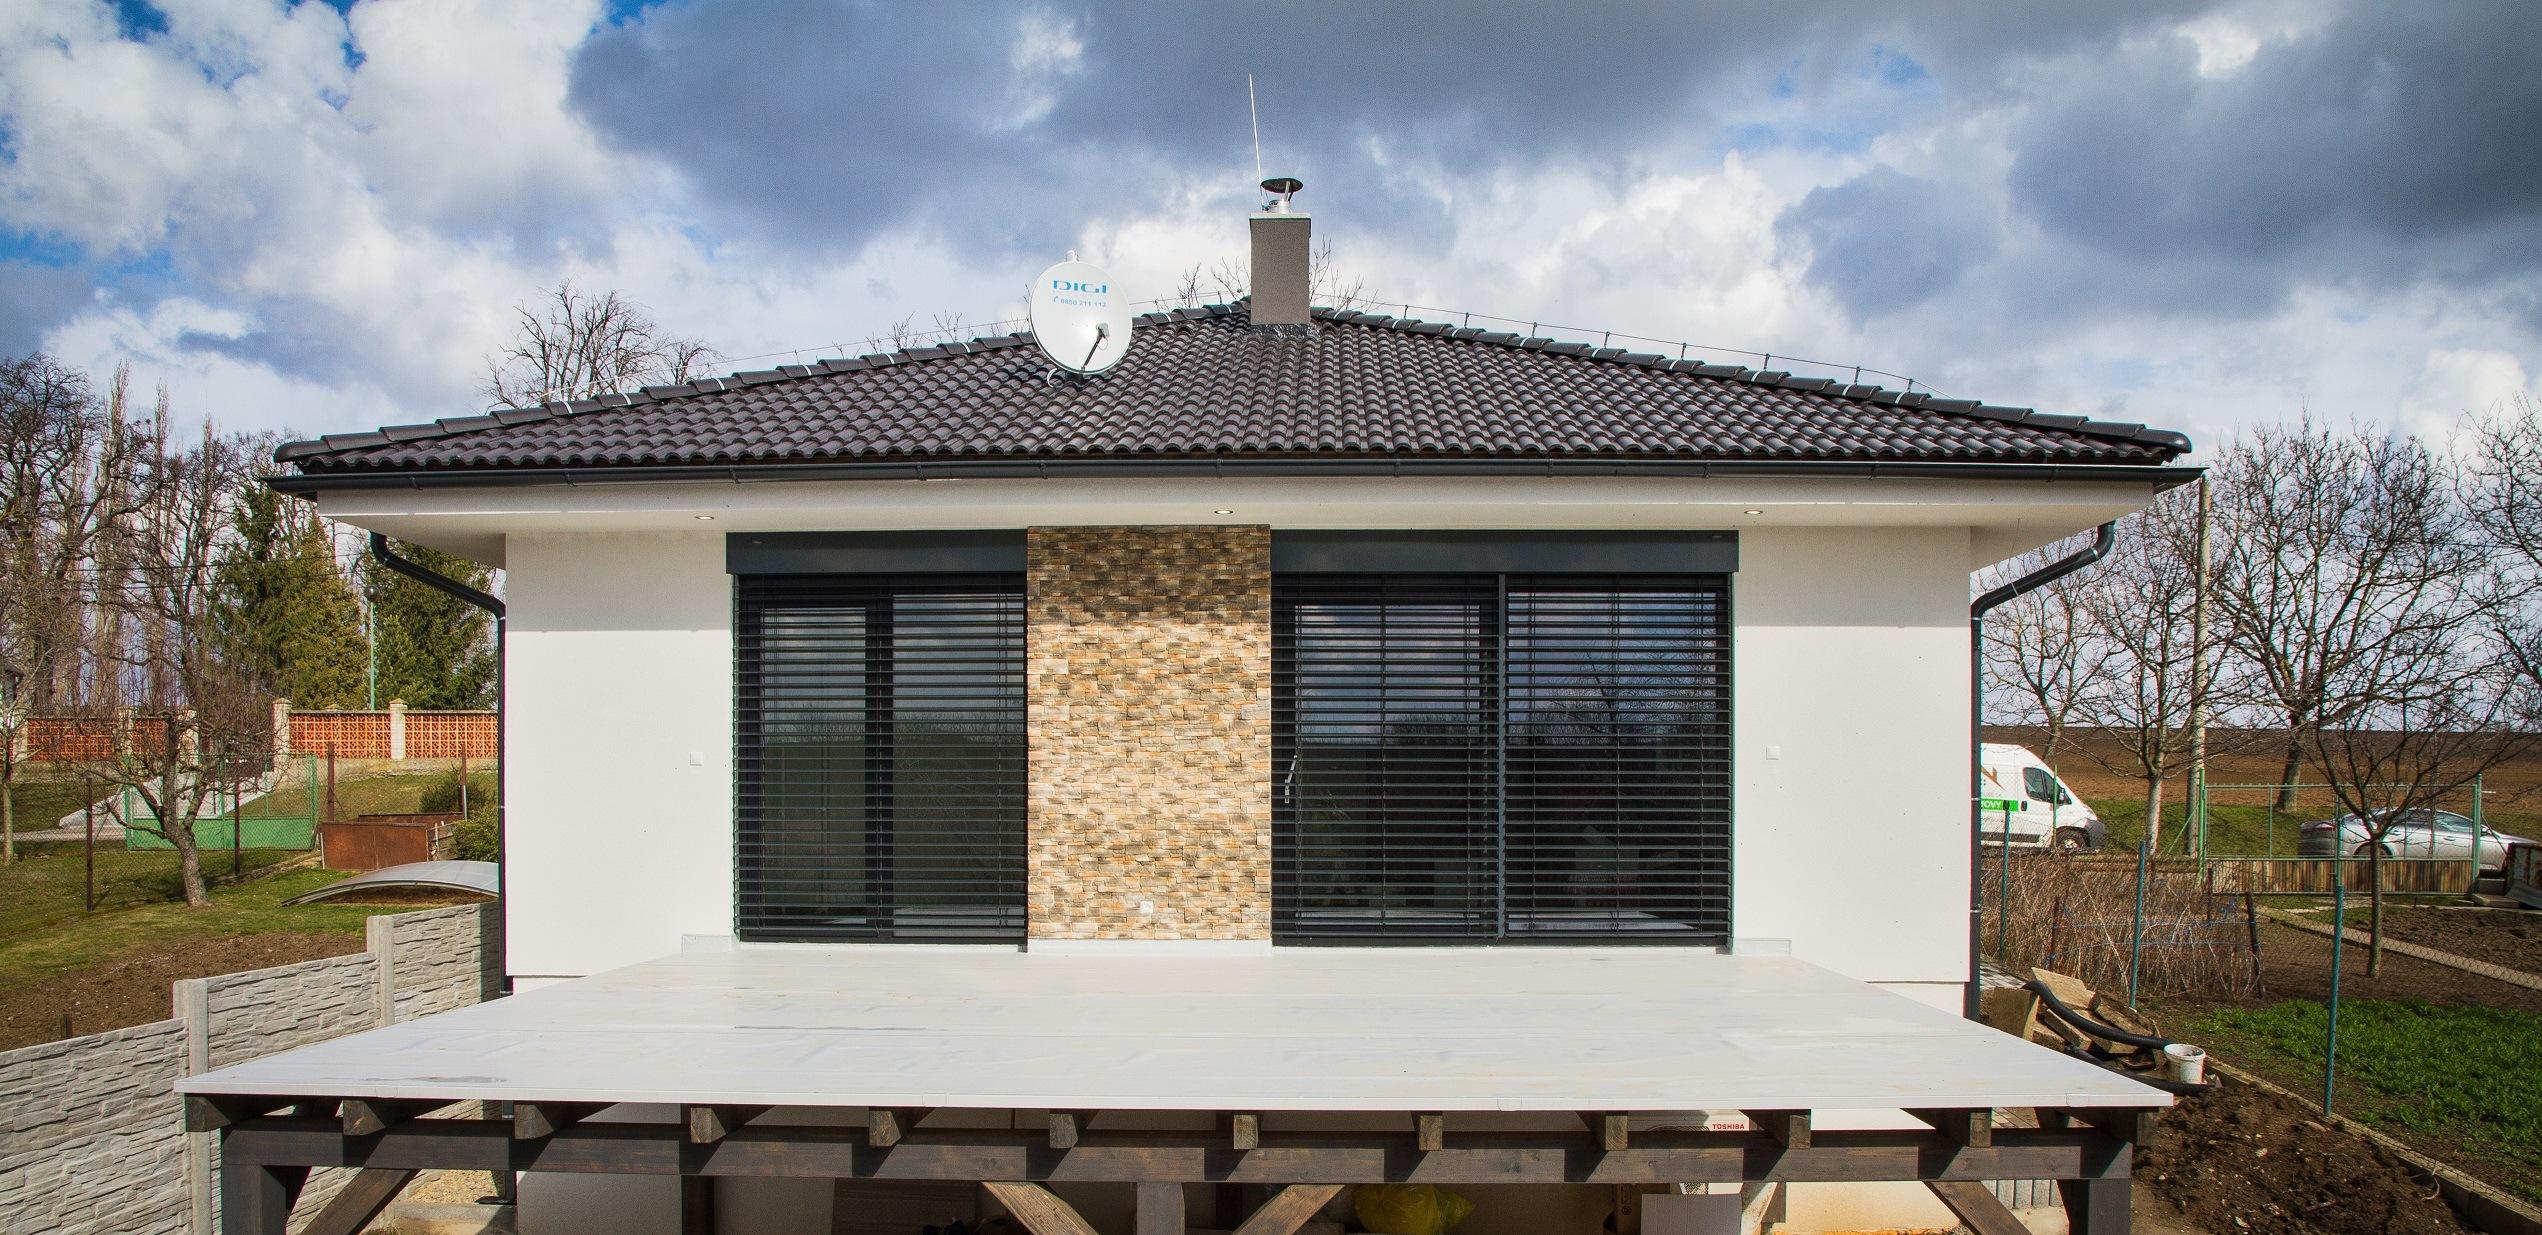 Nízkoenergetický bungalov - referencie woodhouse.sk